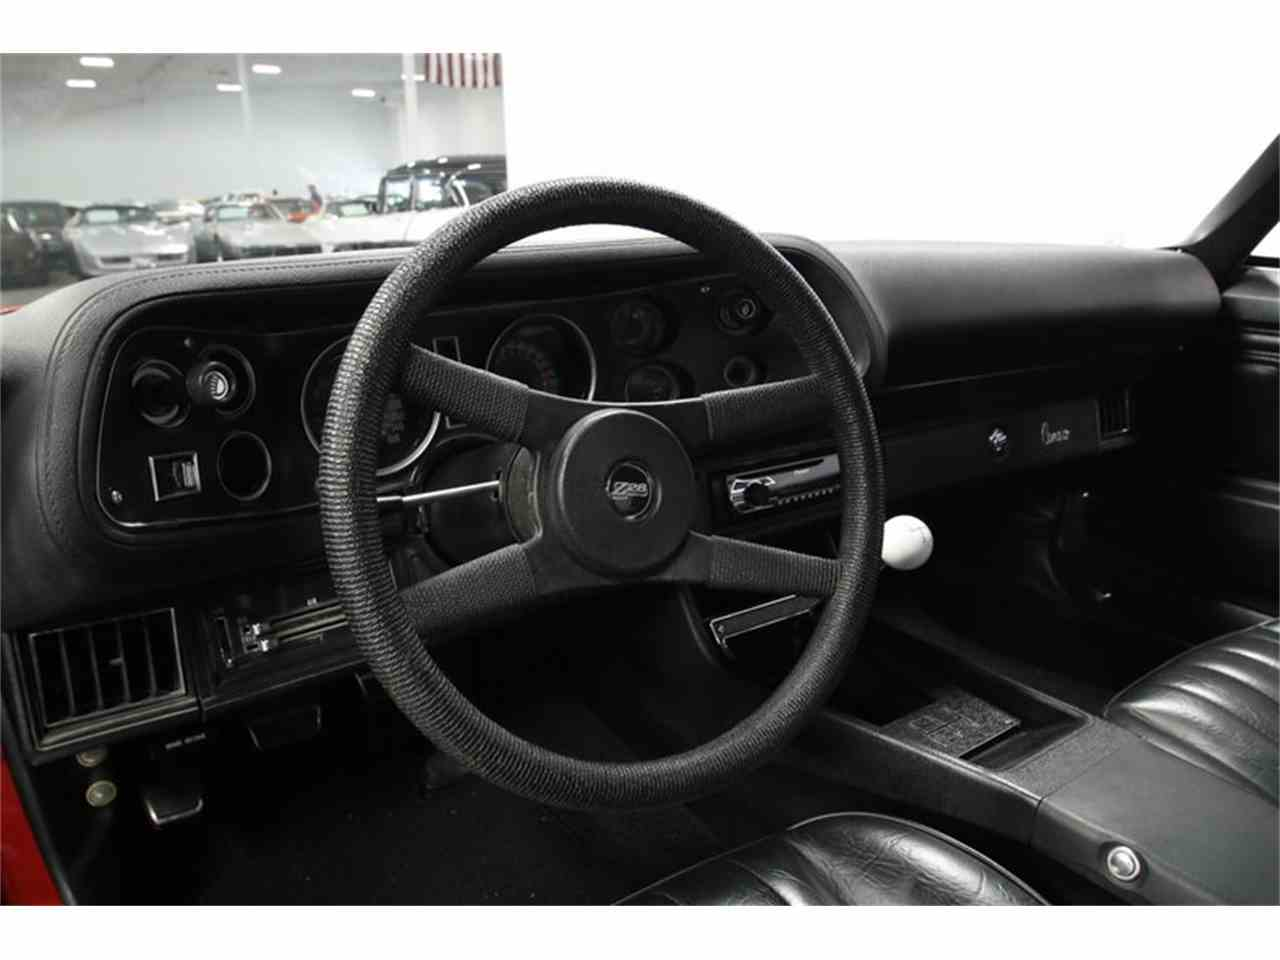 Large Picture of Classic 1971 Camaro Z28 located in Concord North Carolina - $43,995.00 - MC8K